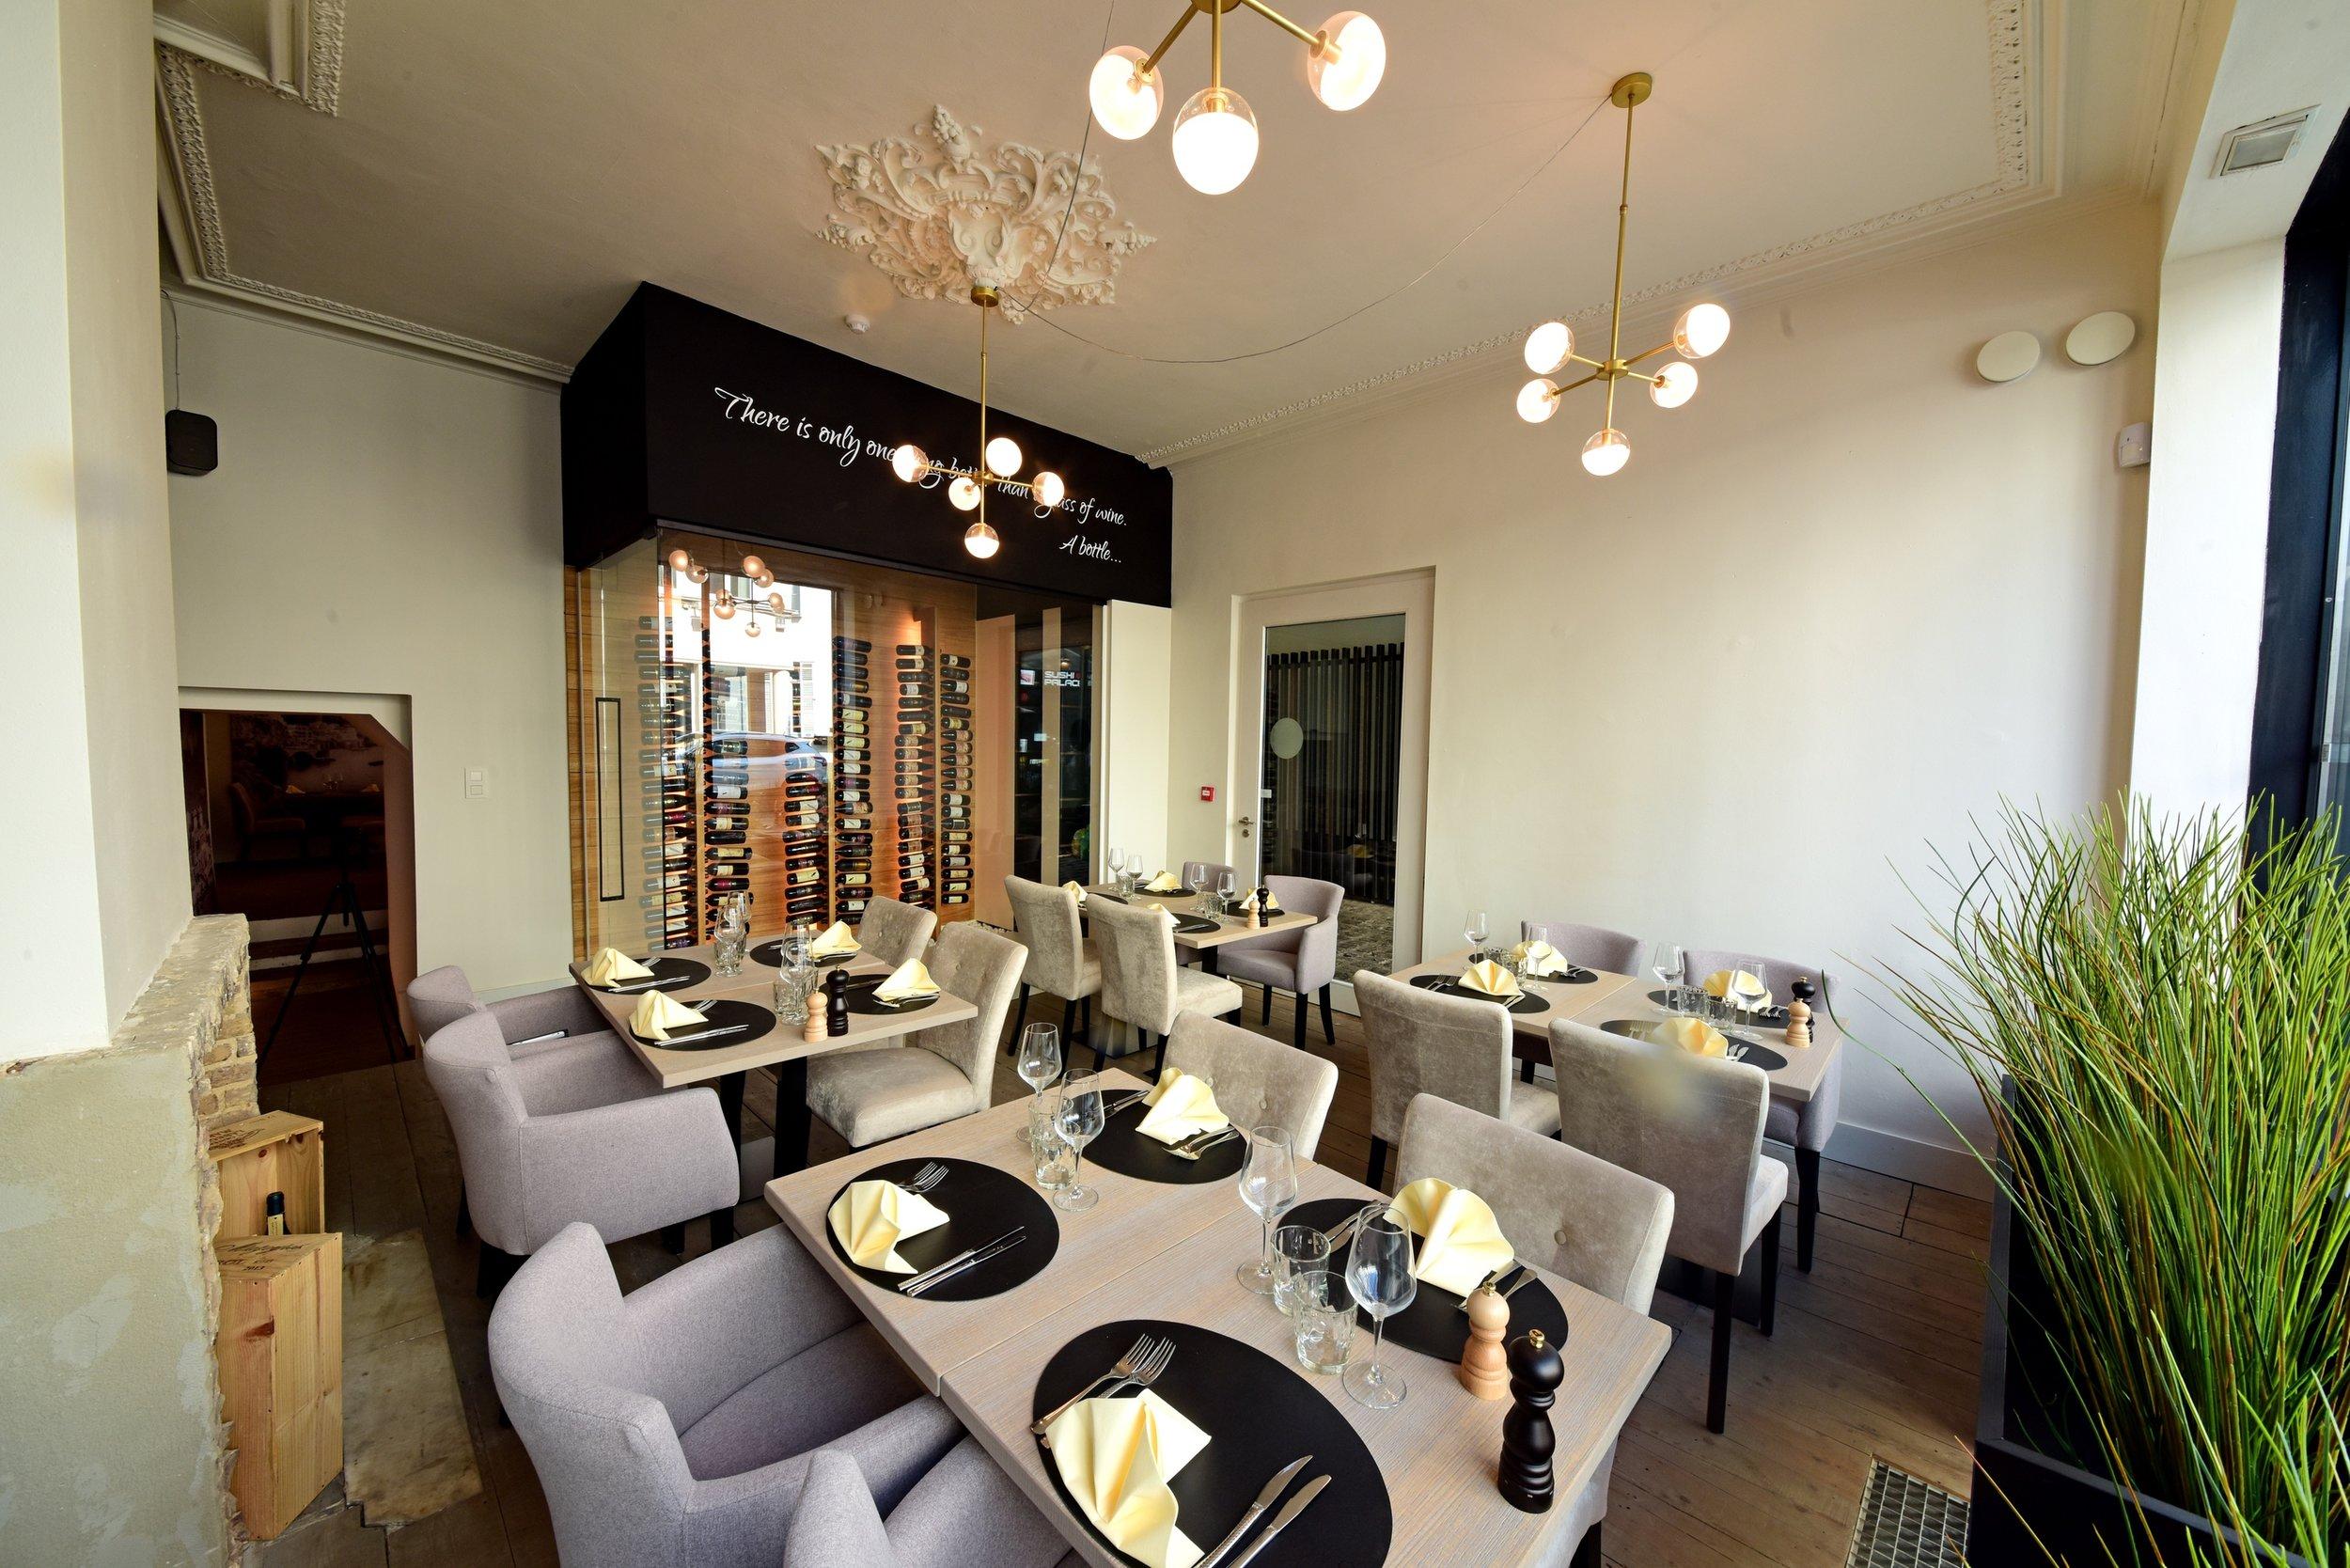 12 italiaans restaurant gent l incontro lincontro.jpg.jpg.jpg.jpg.jpg.jpg